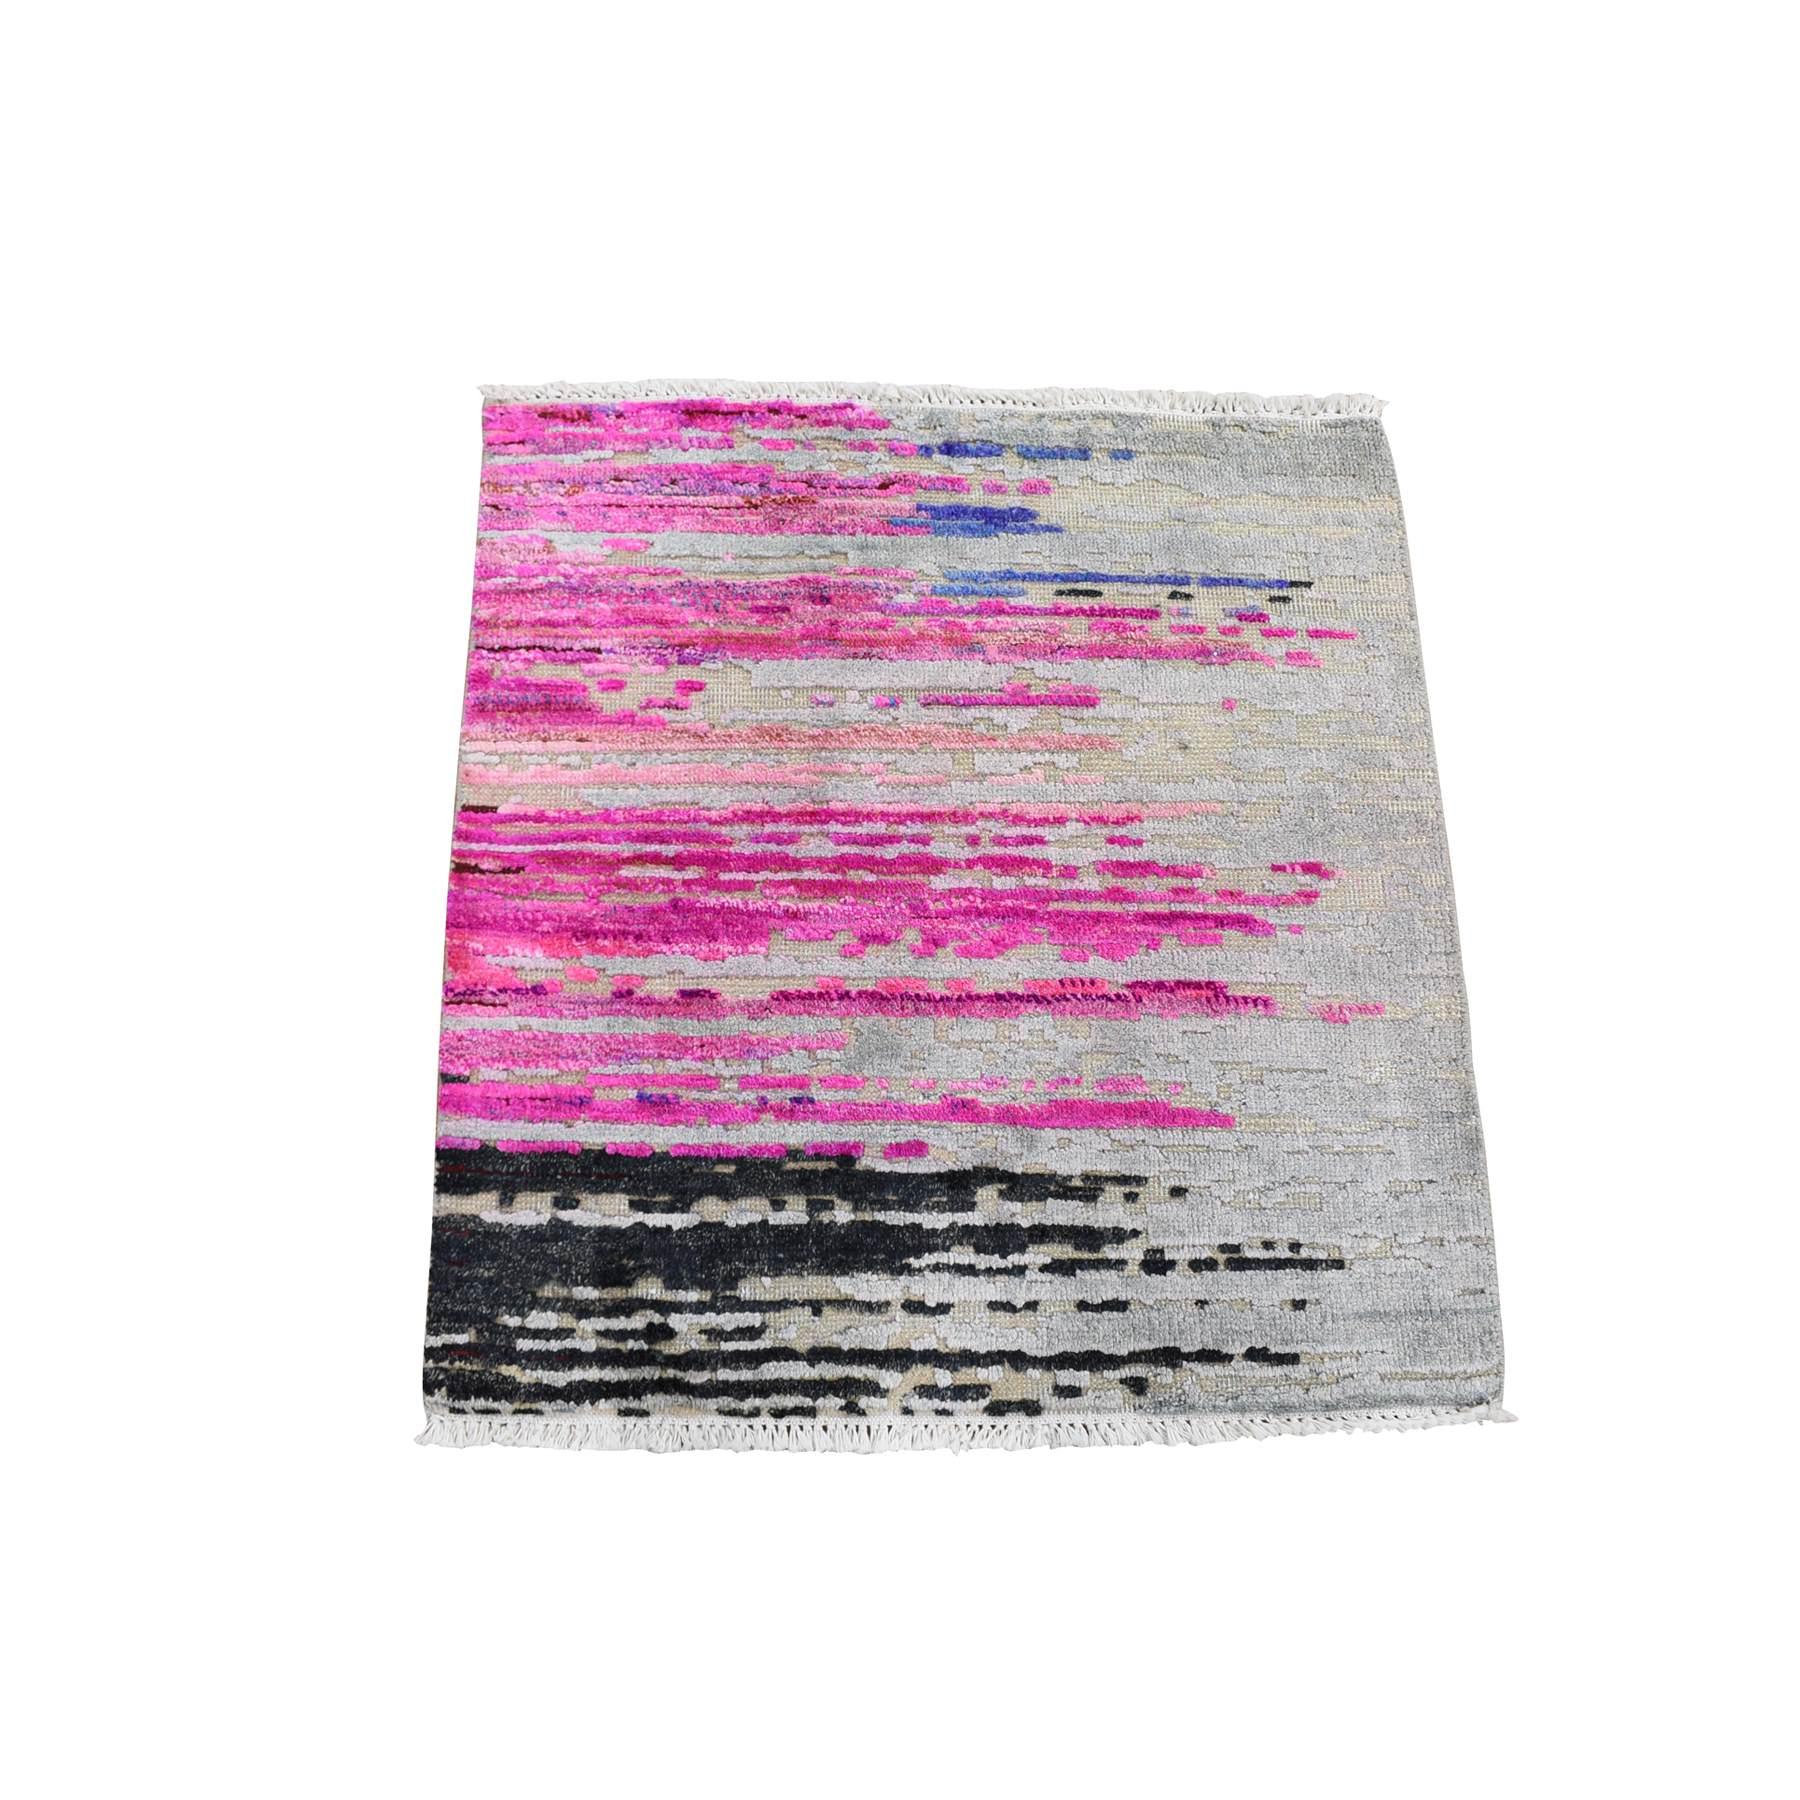 2'X2' Erased Horizontal Line Design ,Pink Sari Silk With Textured Wool Oriental Rug moae9b79